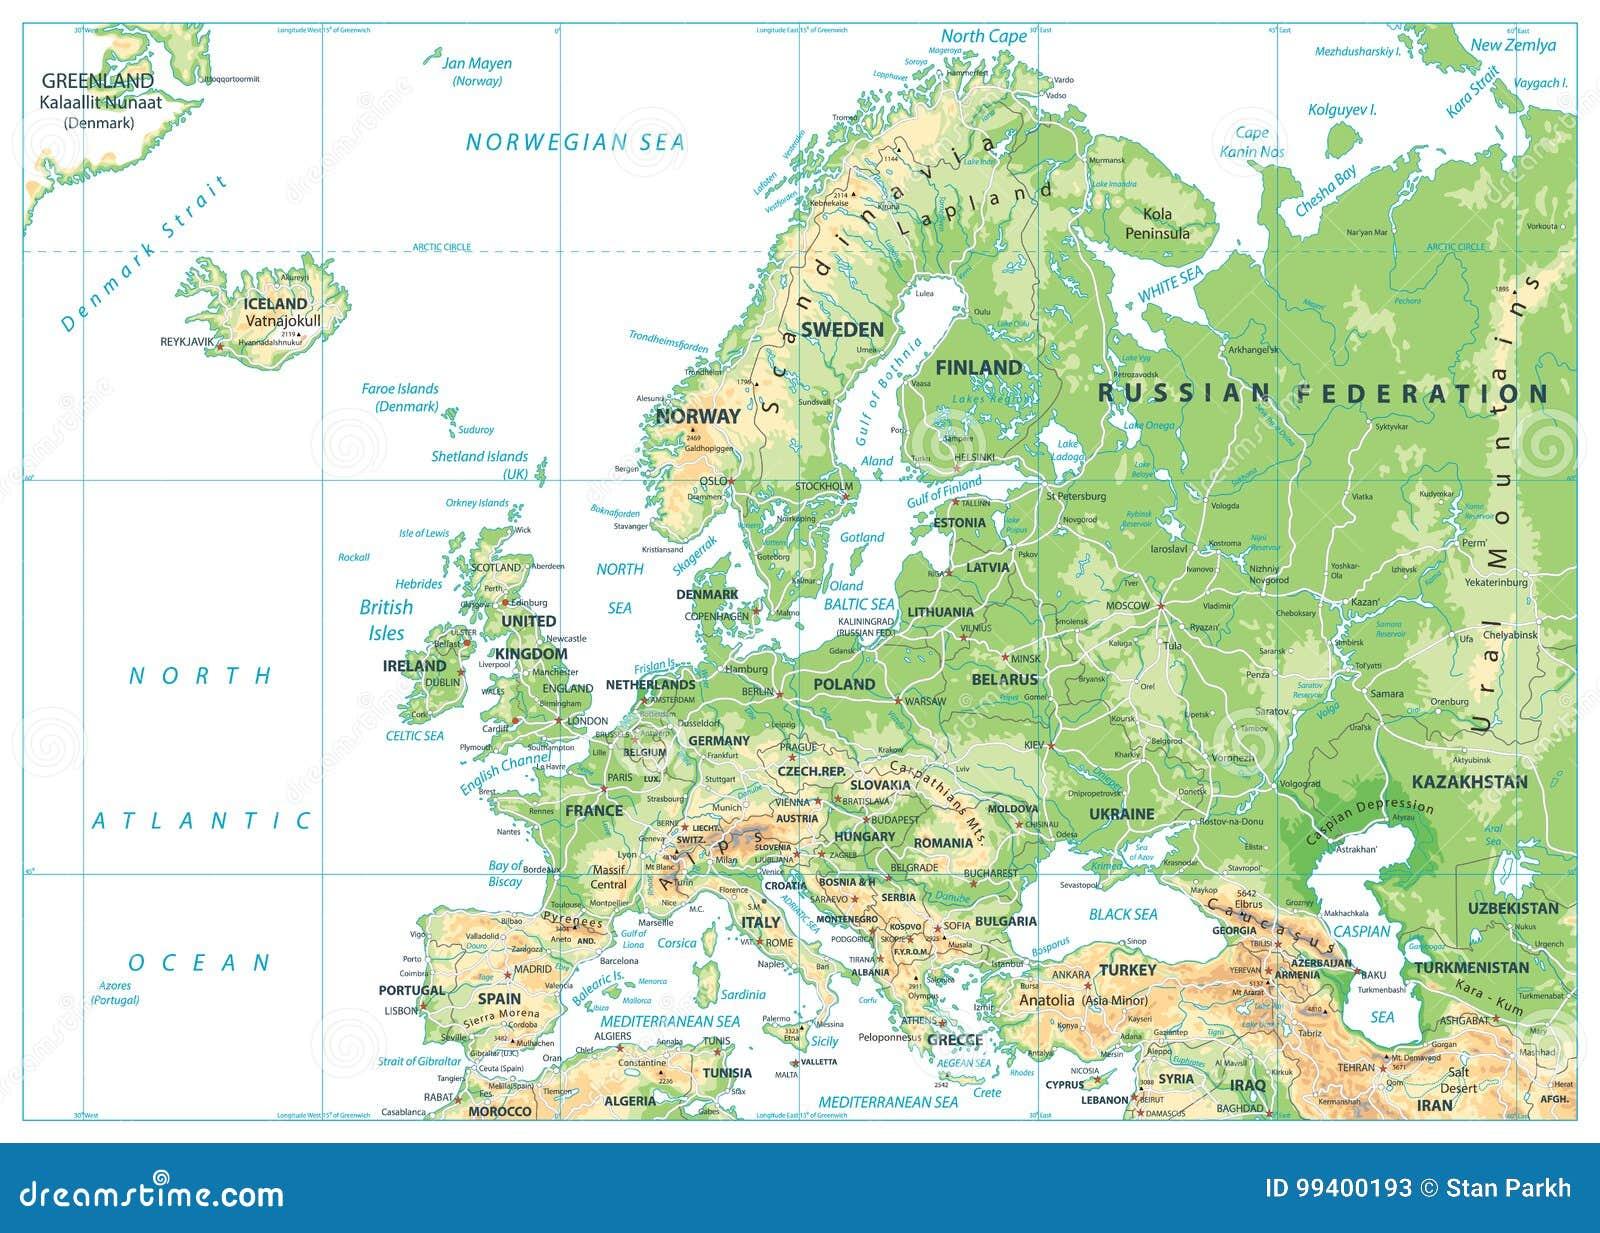 Mapa Físico De Europa.Mapa Fisico De Europa Aislado En Blanco Ilustracion Del